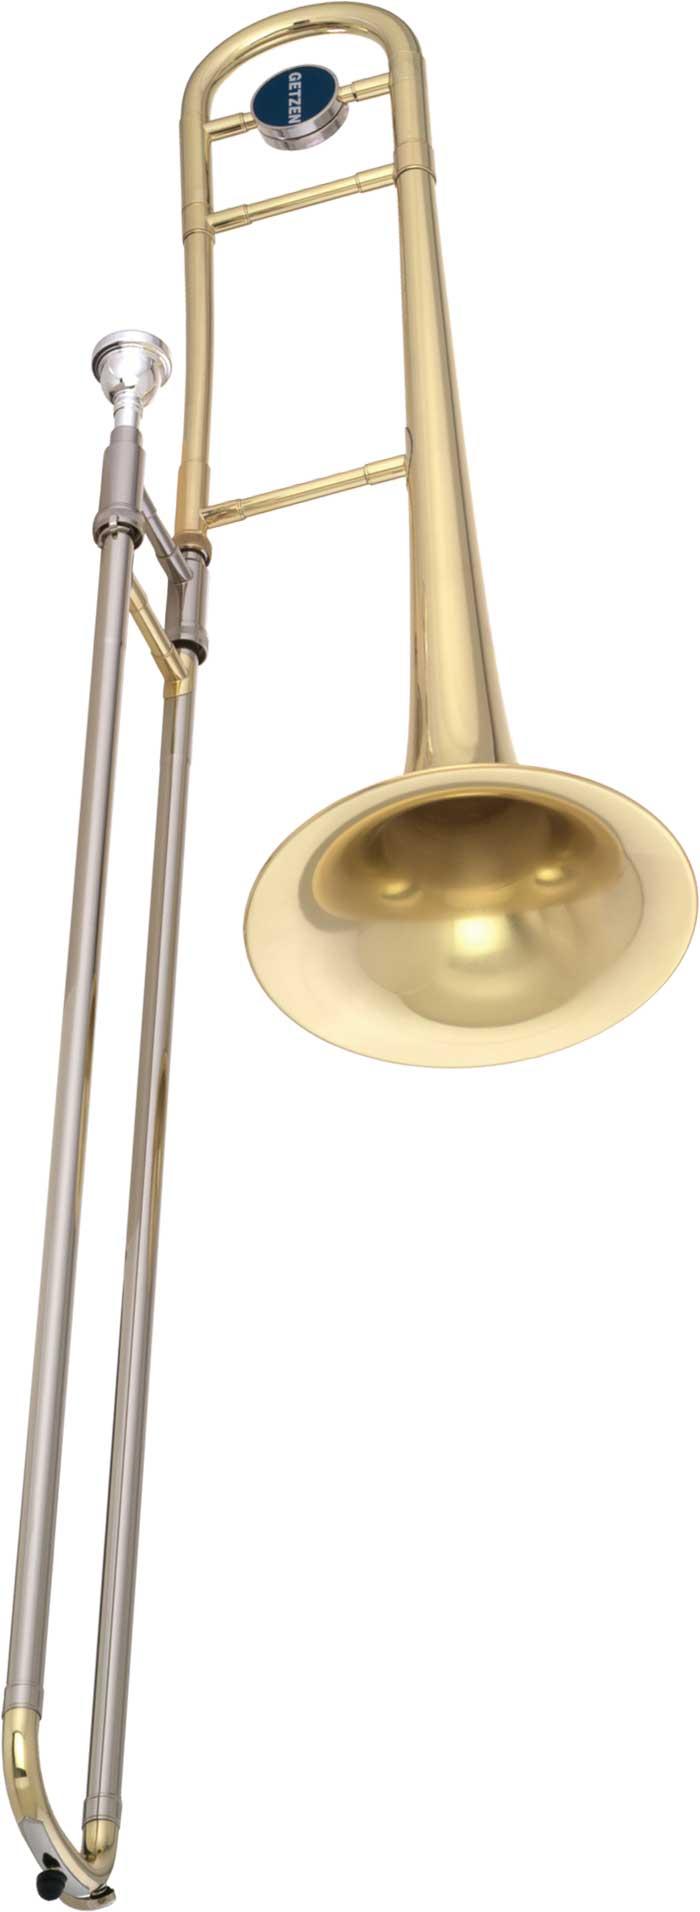 351 Tenor Trombone